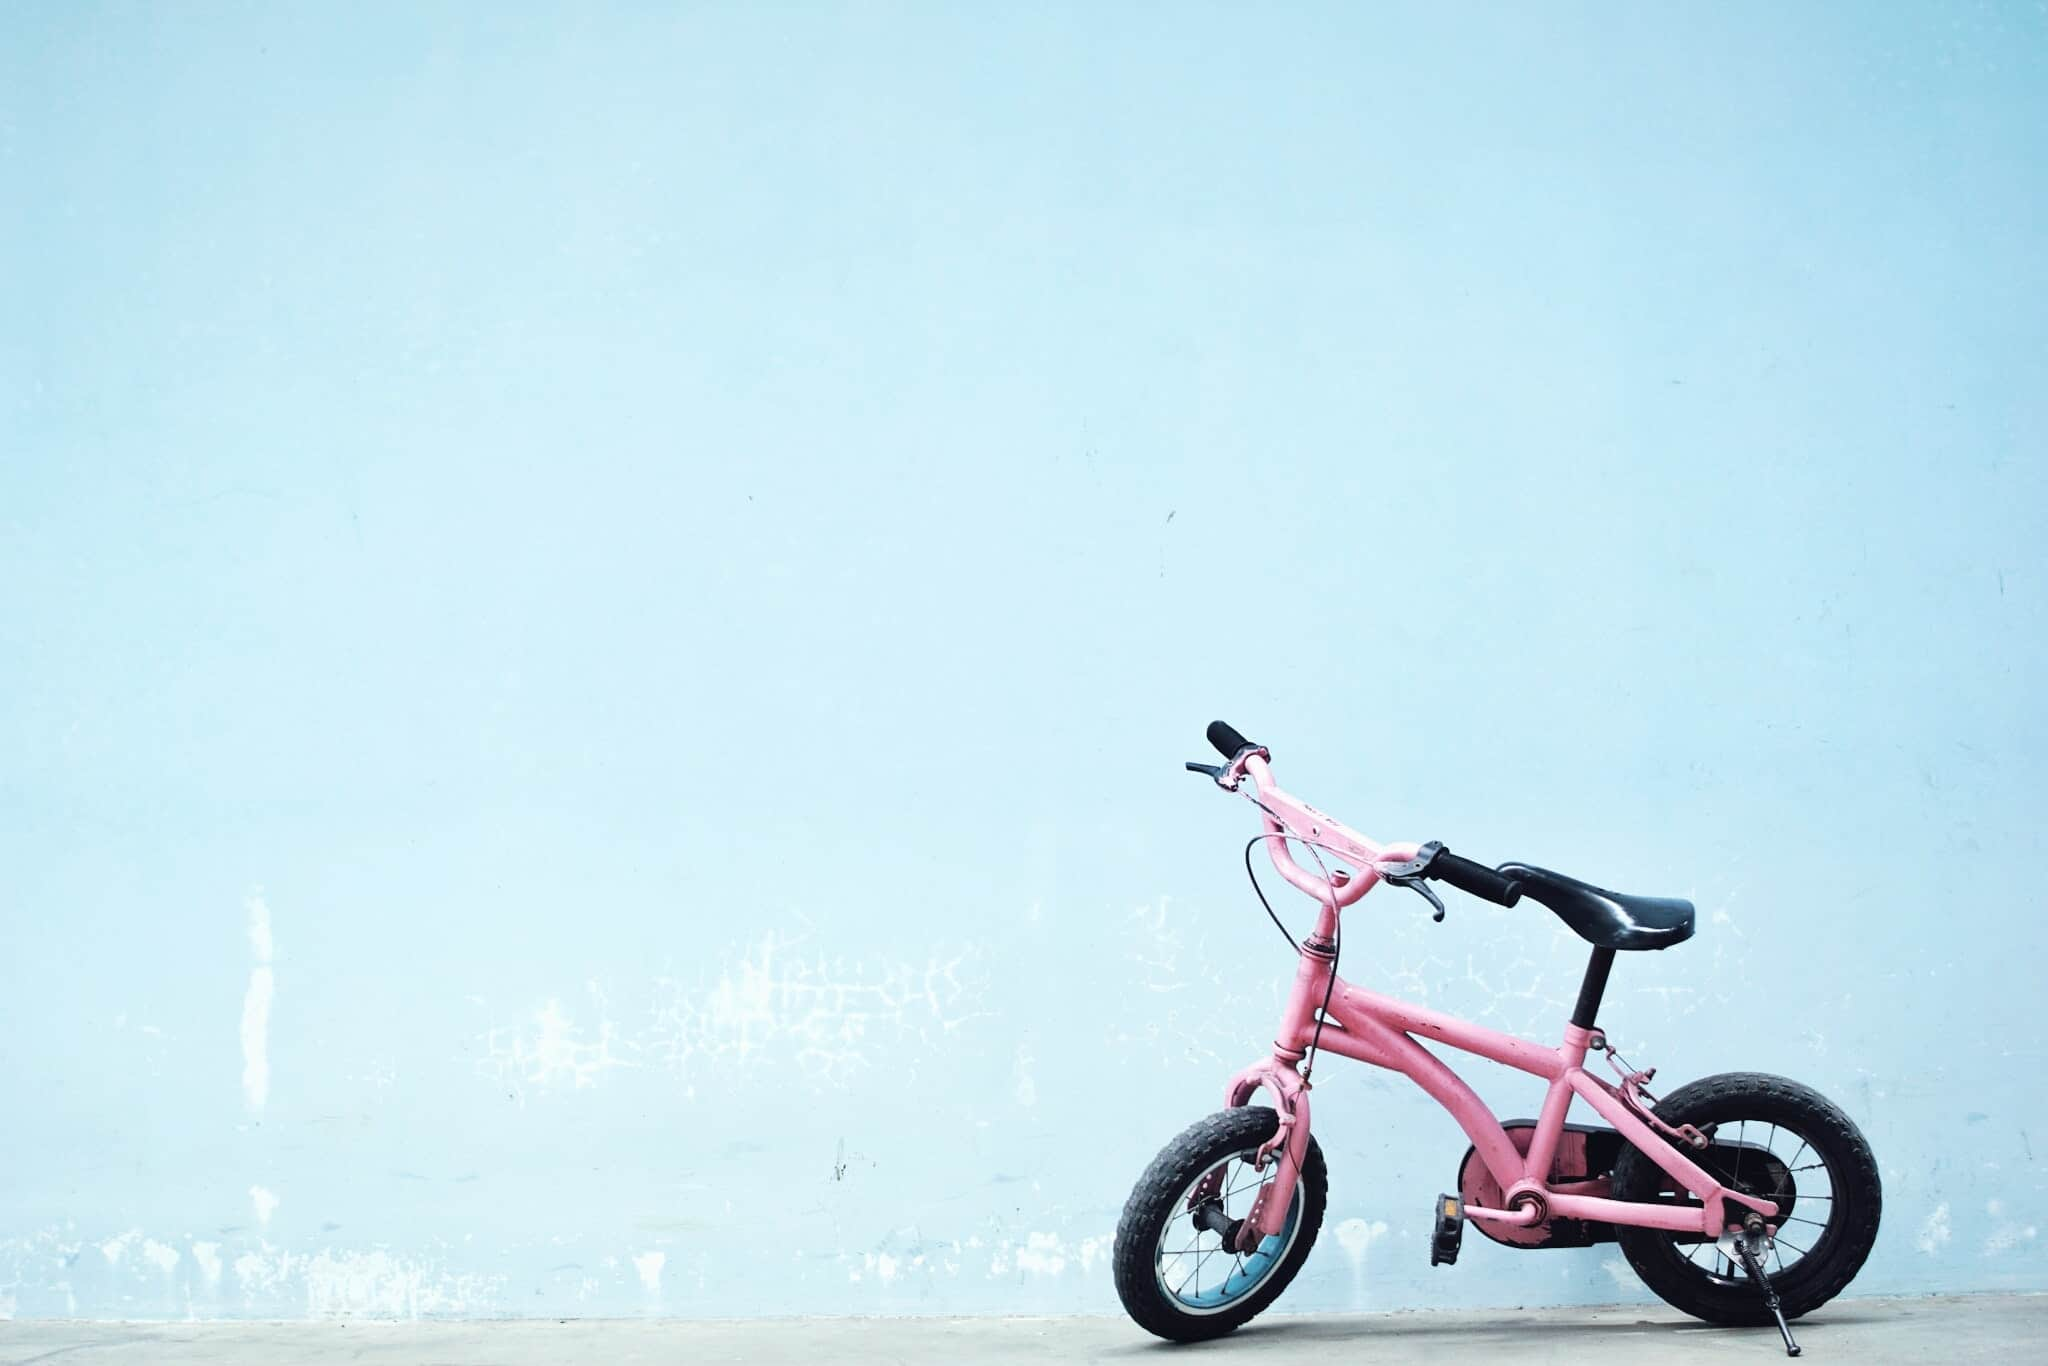 rosa Kinder-Fahrrad vor blauem Grund